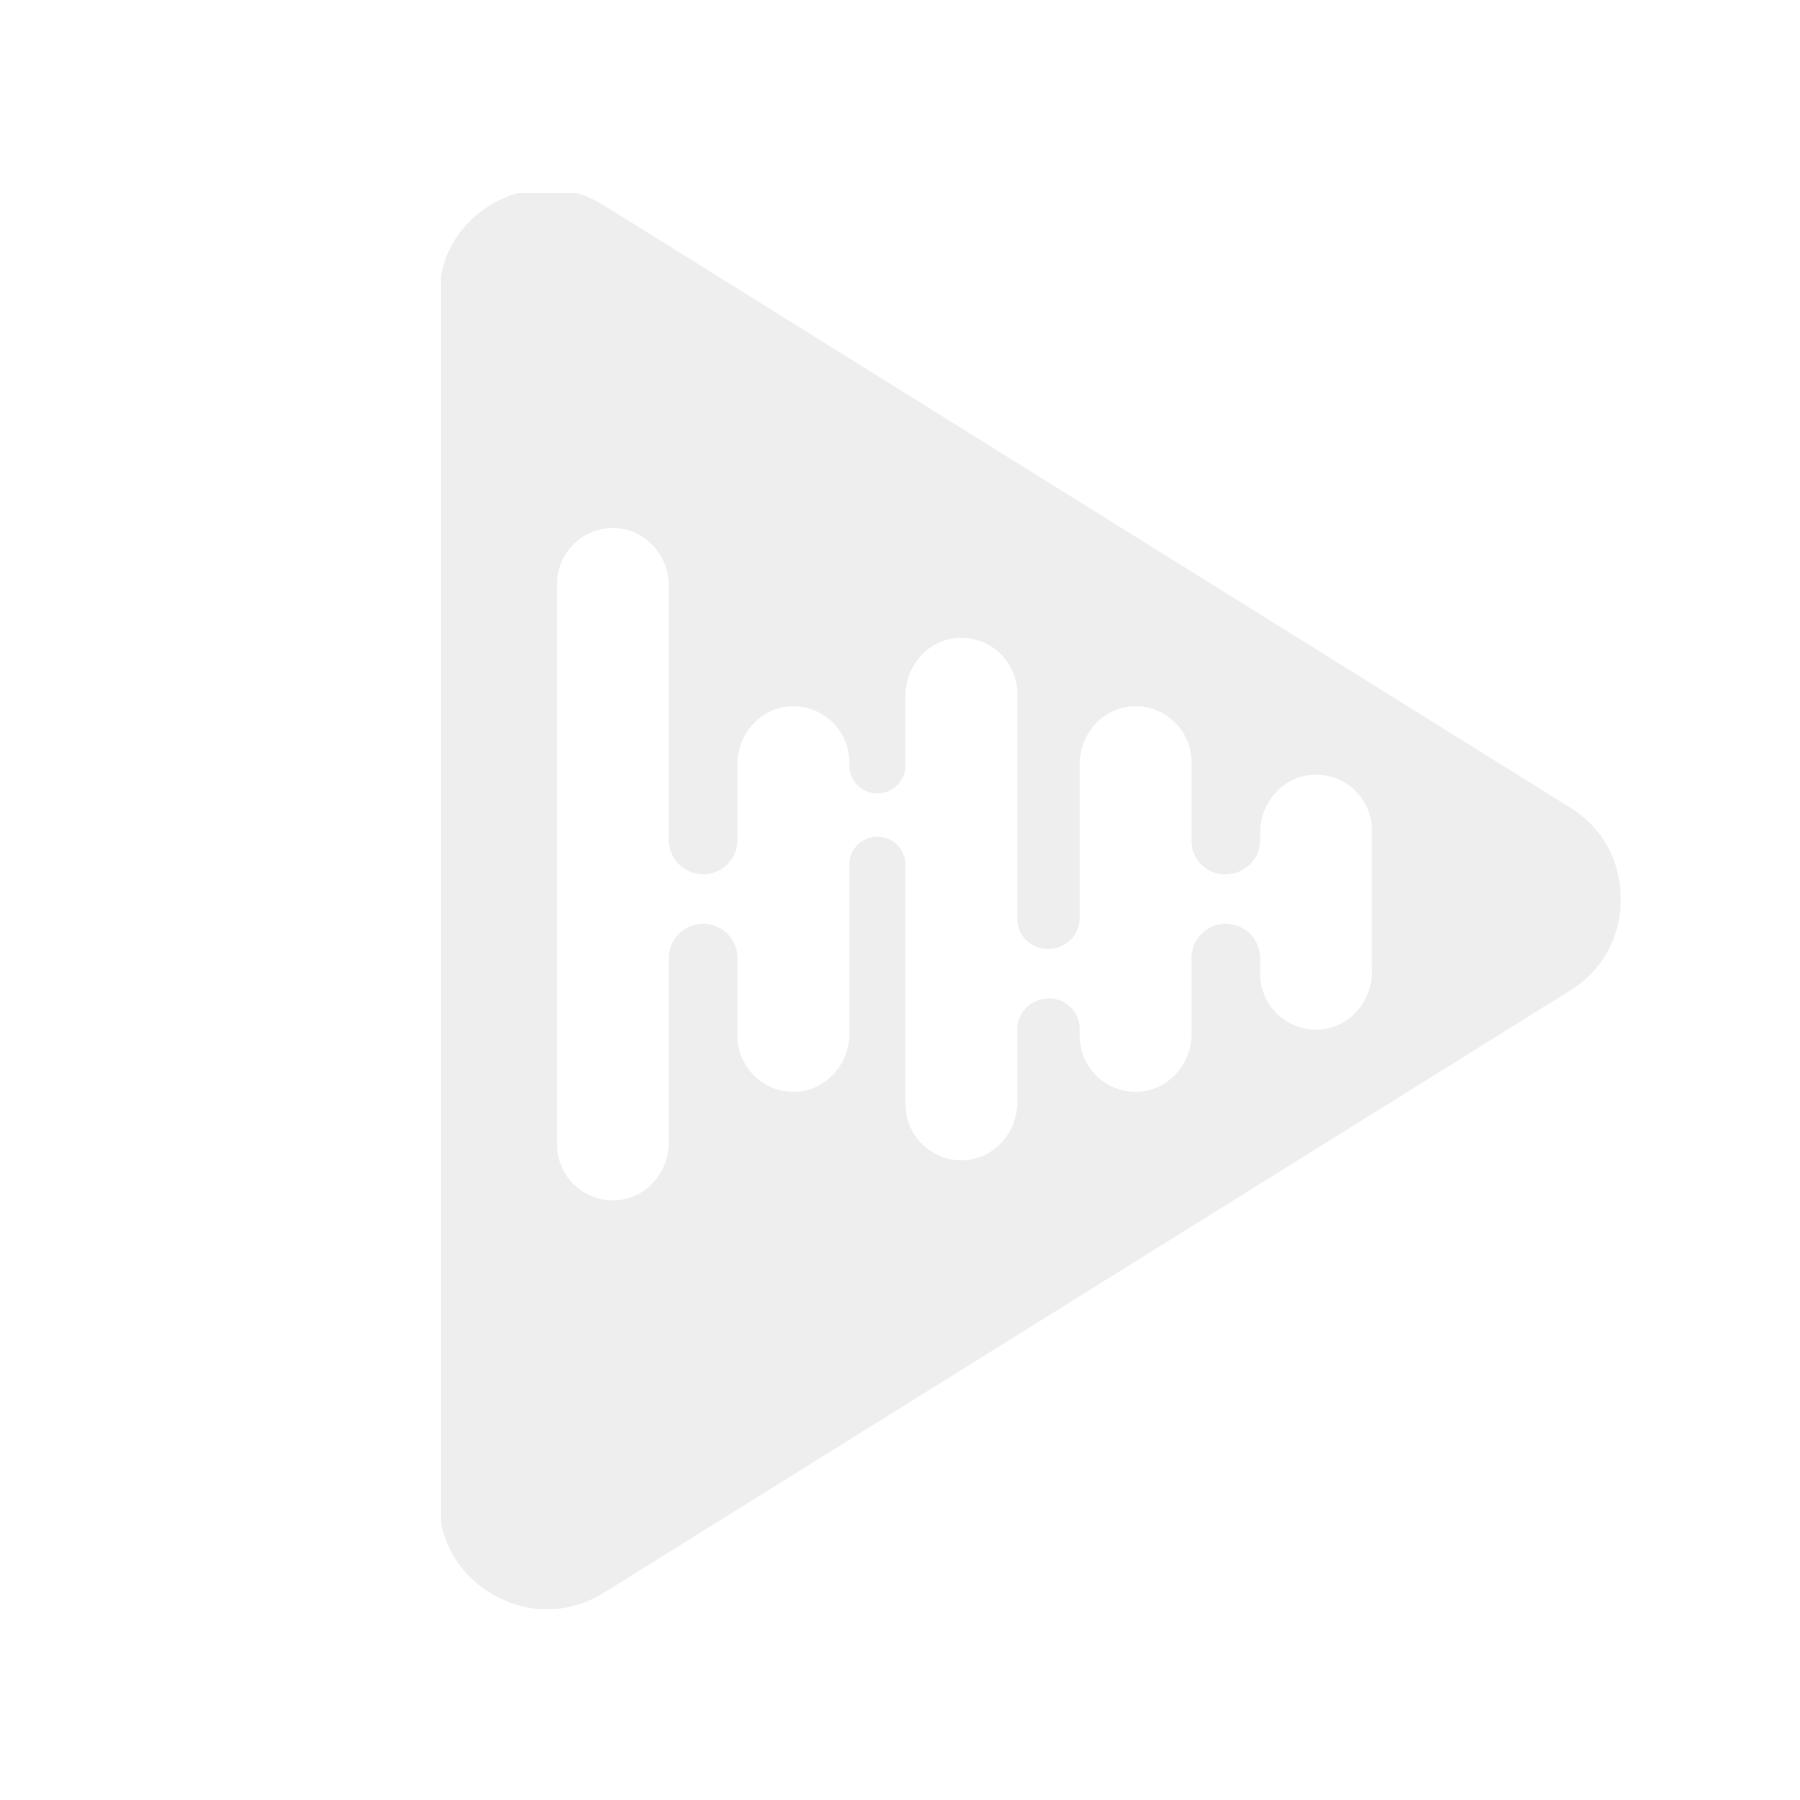 Skoddejuice Bergamot Aroma